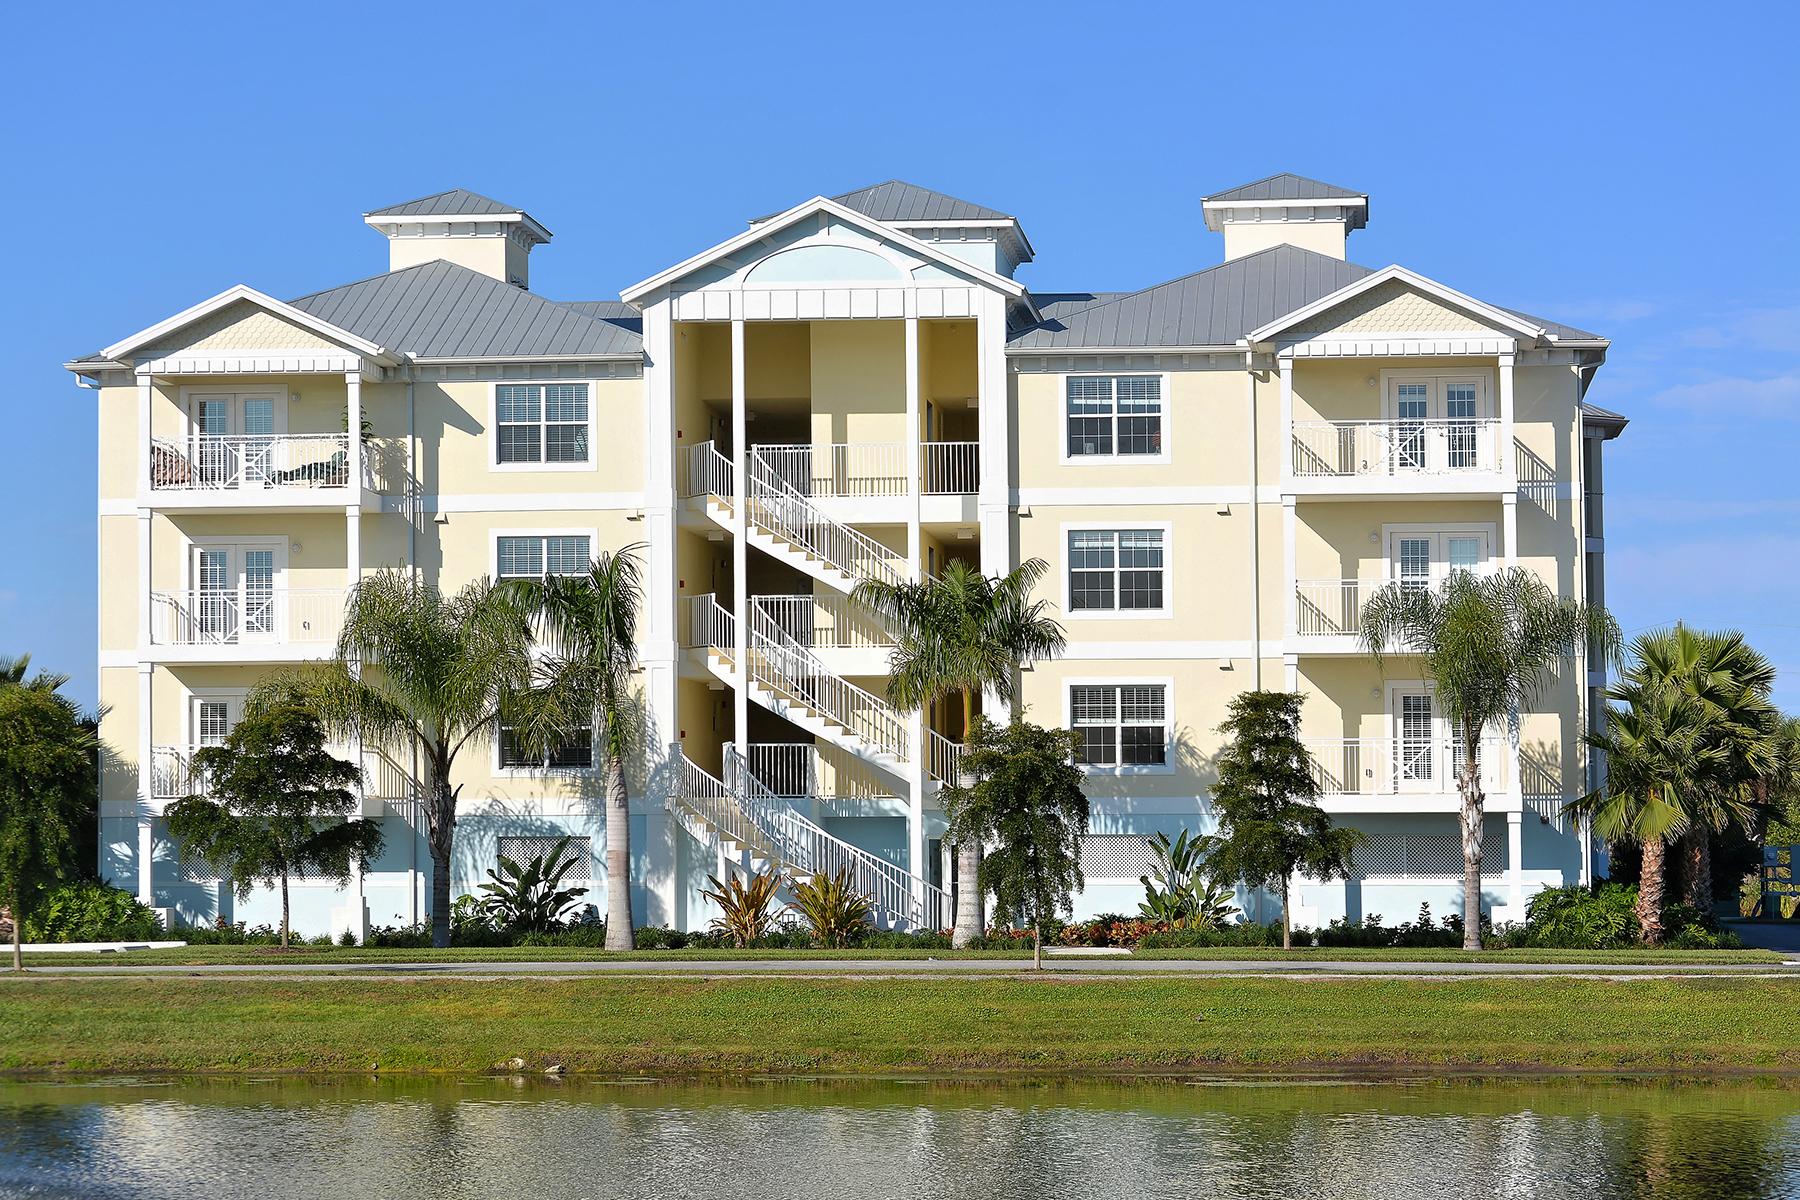 Condominium for Sale at PALMA SOLA BAY CLUB 7810 34th Ave W 102 Bradenton, Florida 34209 United States